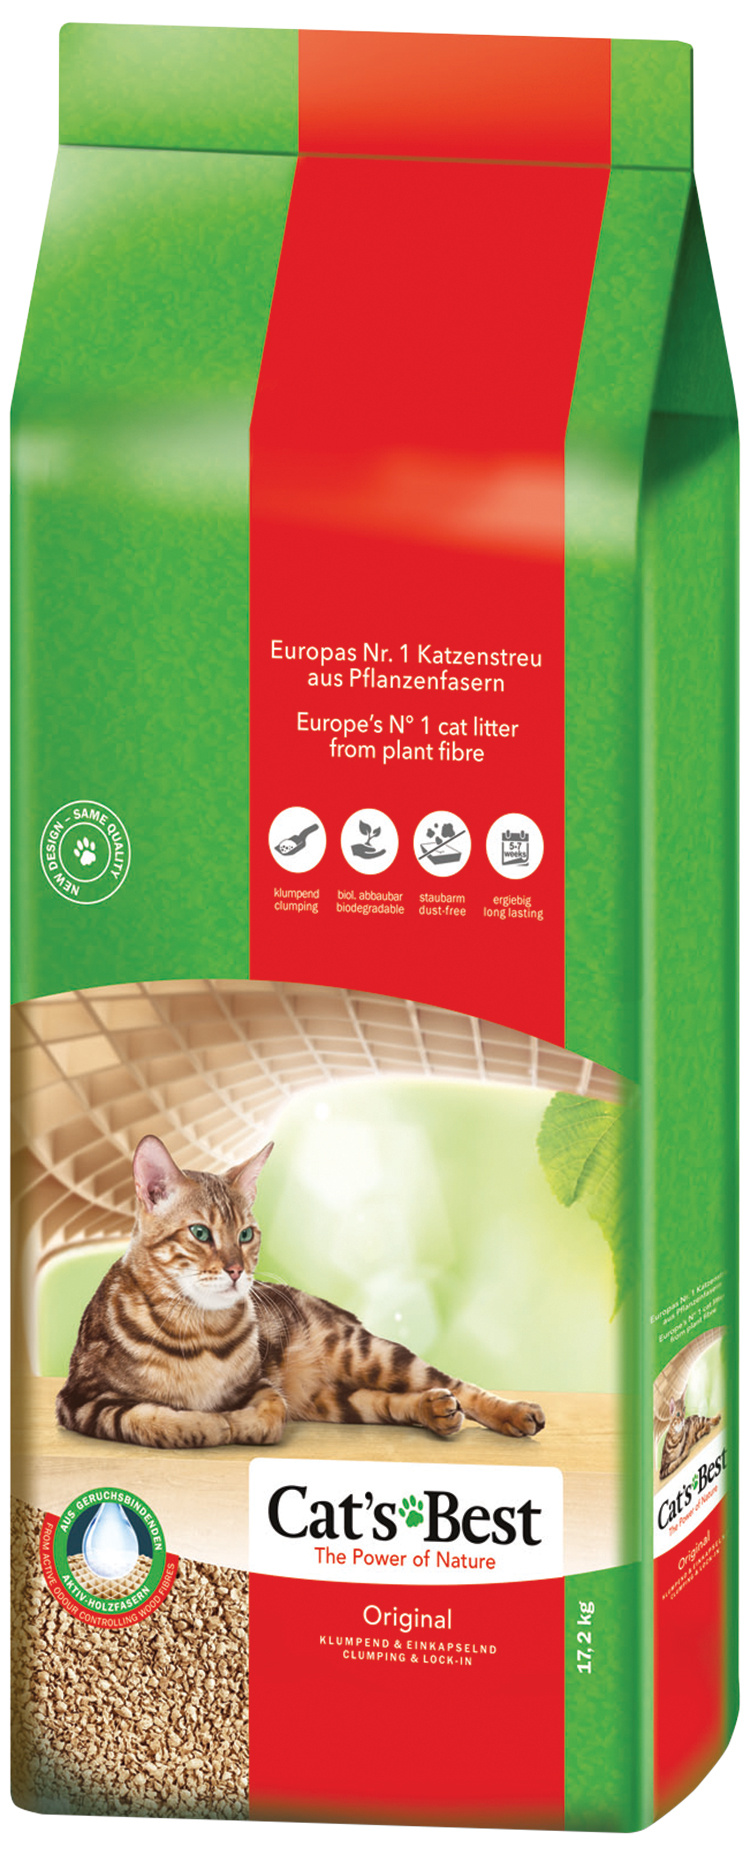 Kockolit Jrs Cats Best Original 40l Super Zoo